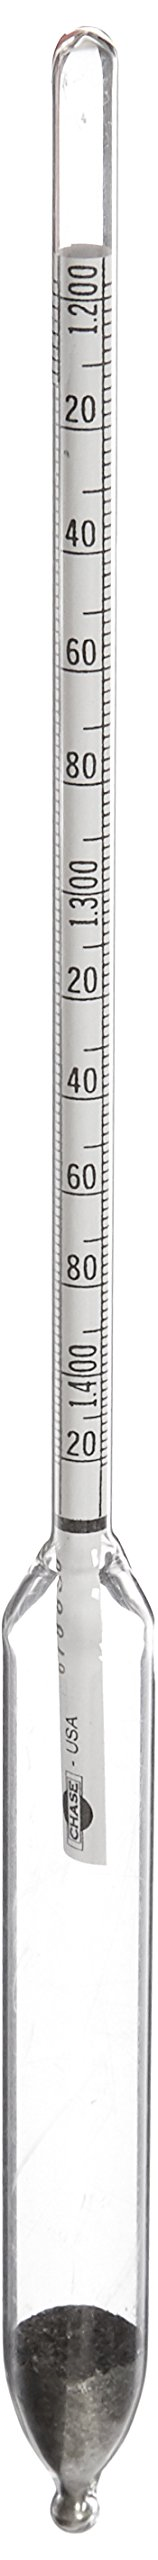 Chase Instruments 1982 Heavy Liquid Specific Gravity Hydrometer, 1.200-1.420mm Graduation Range, 0.002mm Interval